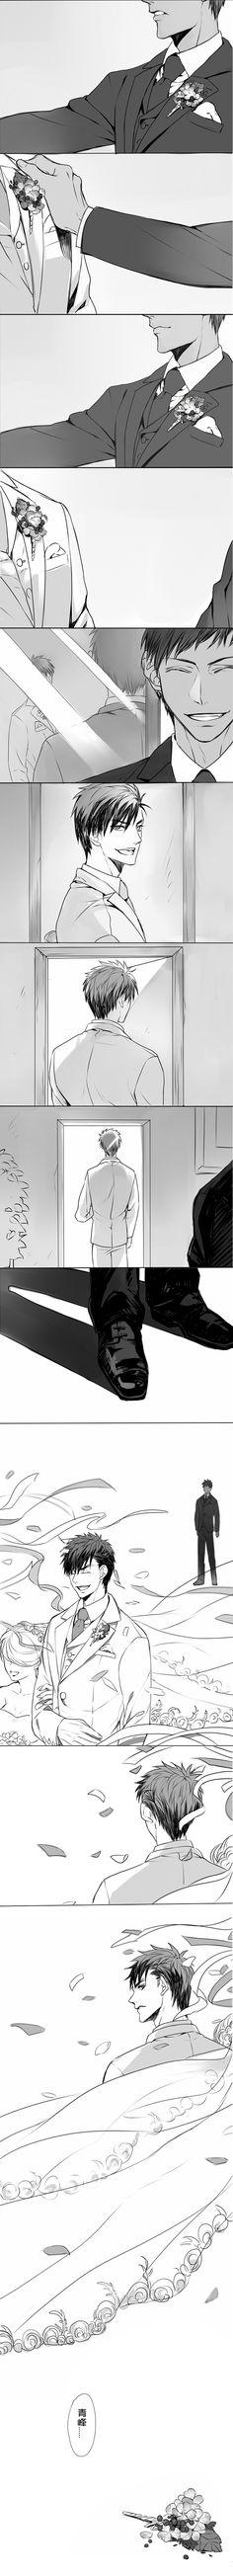 「o(*^▽^*)o」/「眼镜镜镜」の漫画 [pixiv] 2